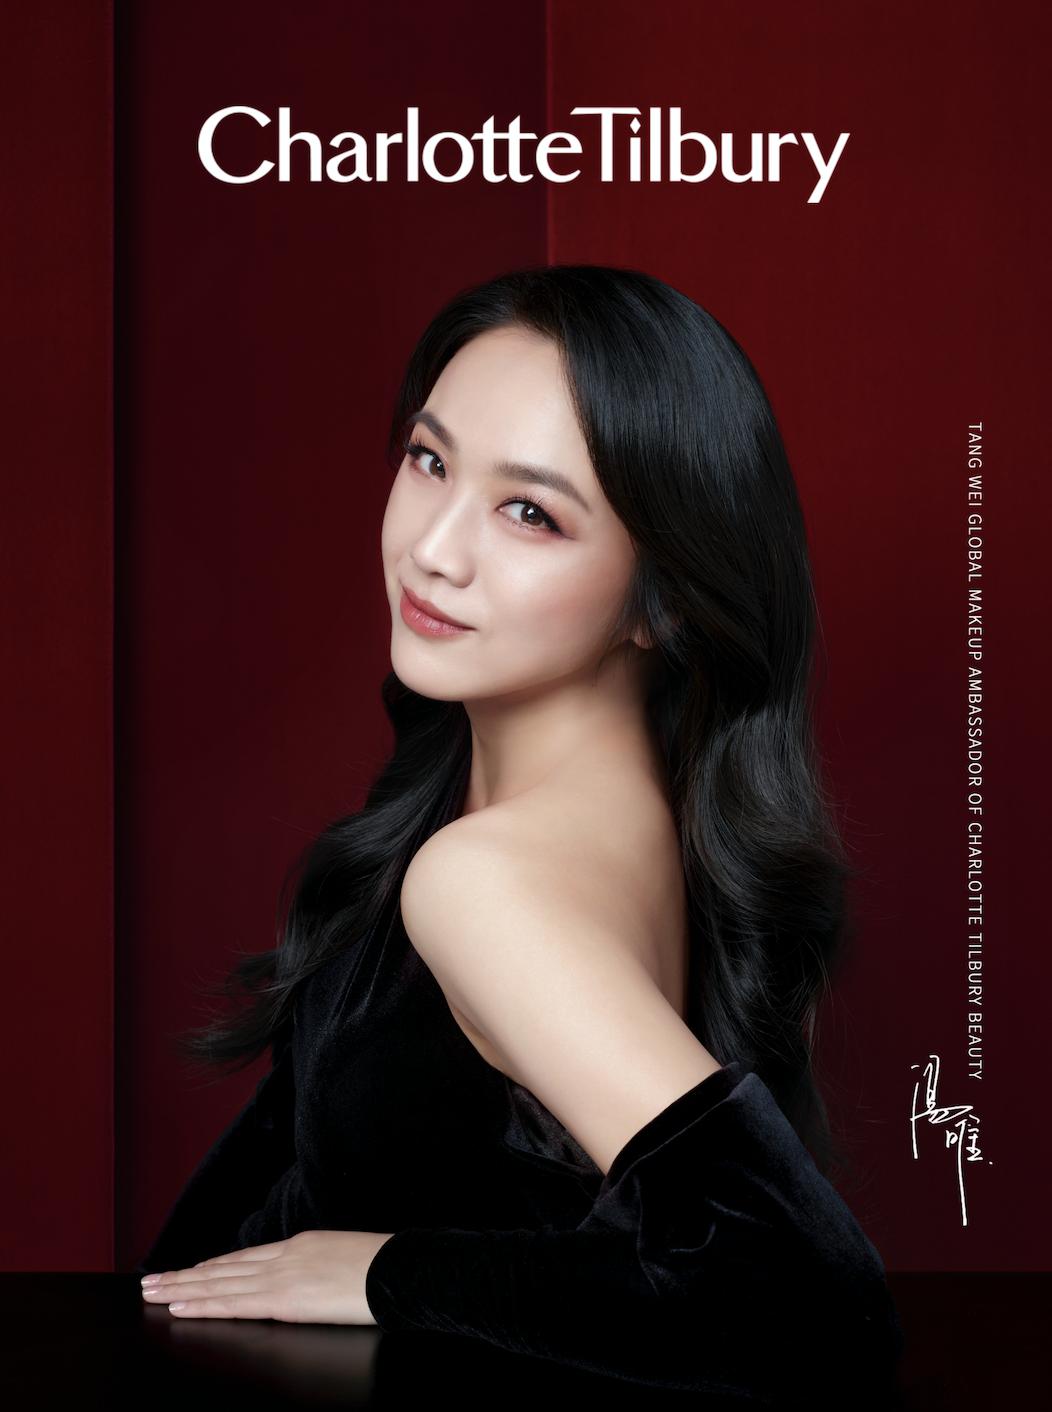 Tang Wei is Charlotte Tilbury's First Global Makeup Ambassador